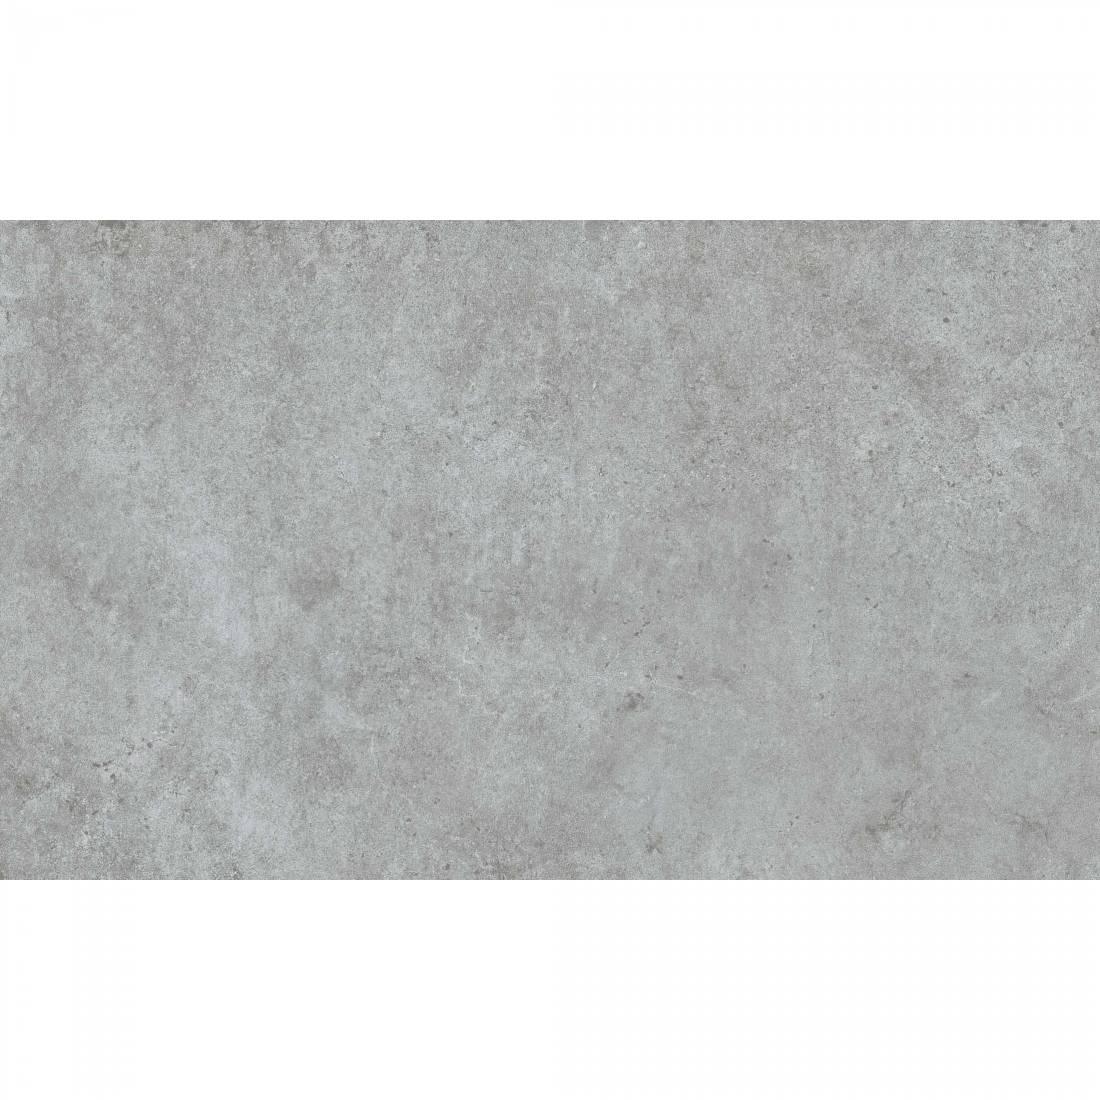 Belgravia 33.3x55 Gris Matt 1